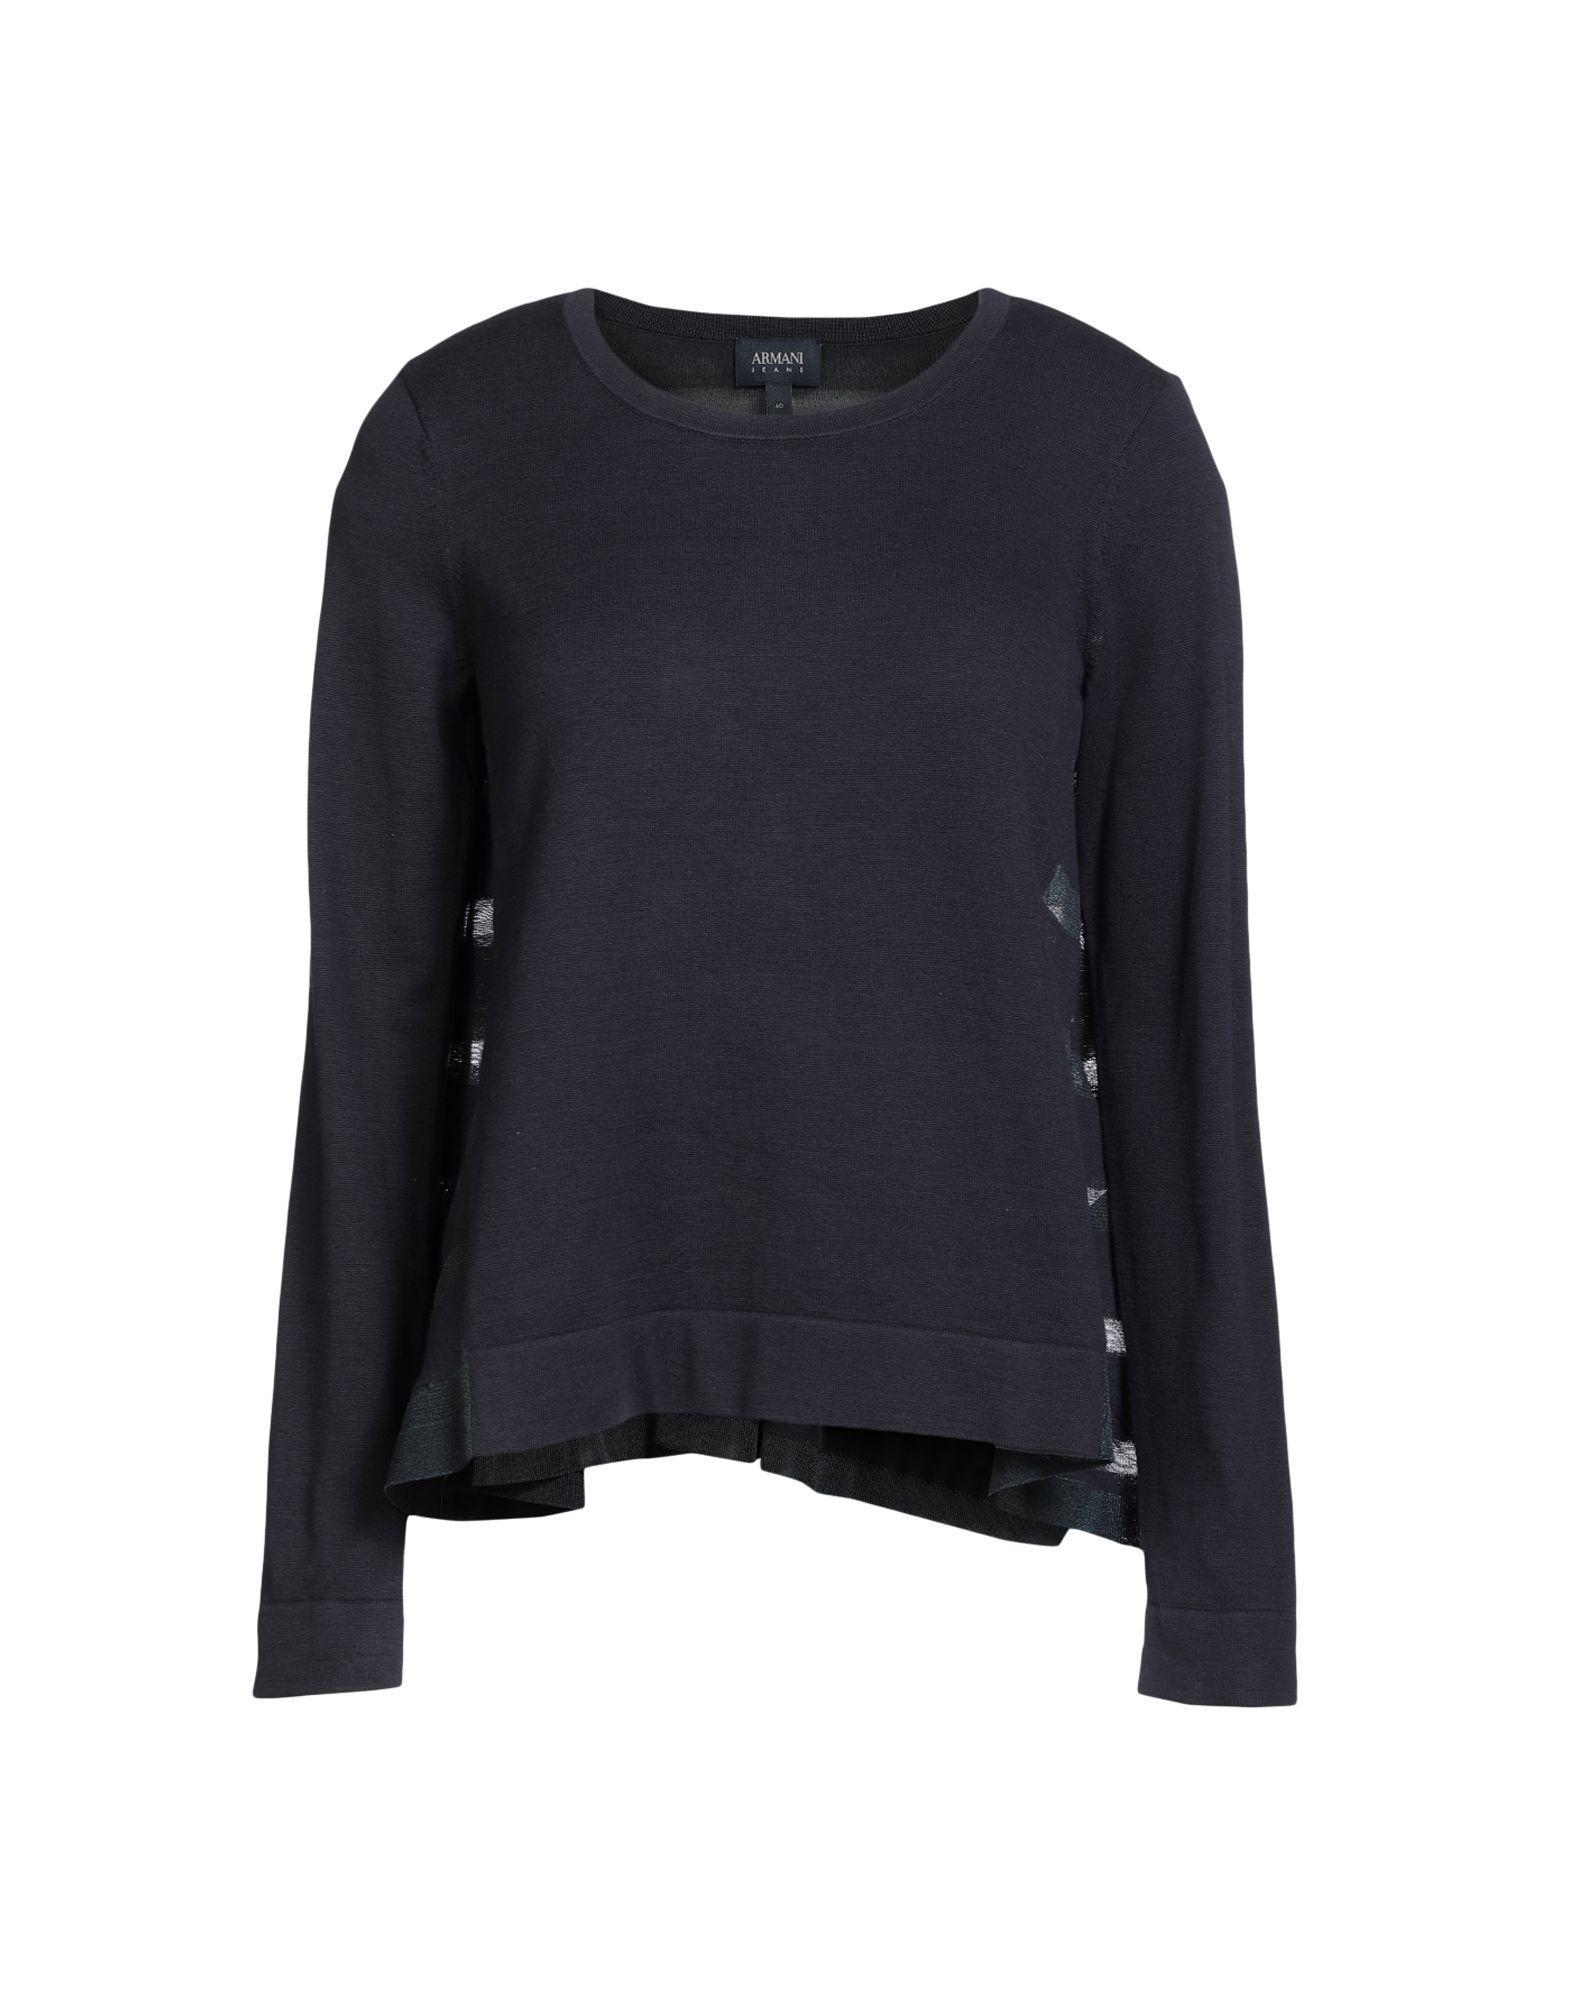 Armani Jeans Sweater In Dark Blue